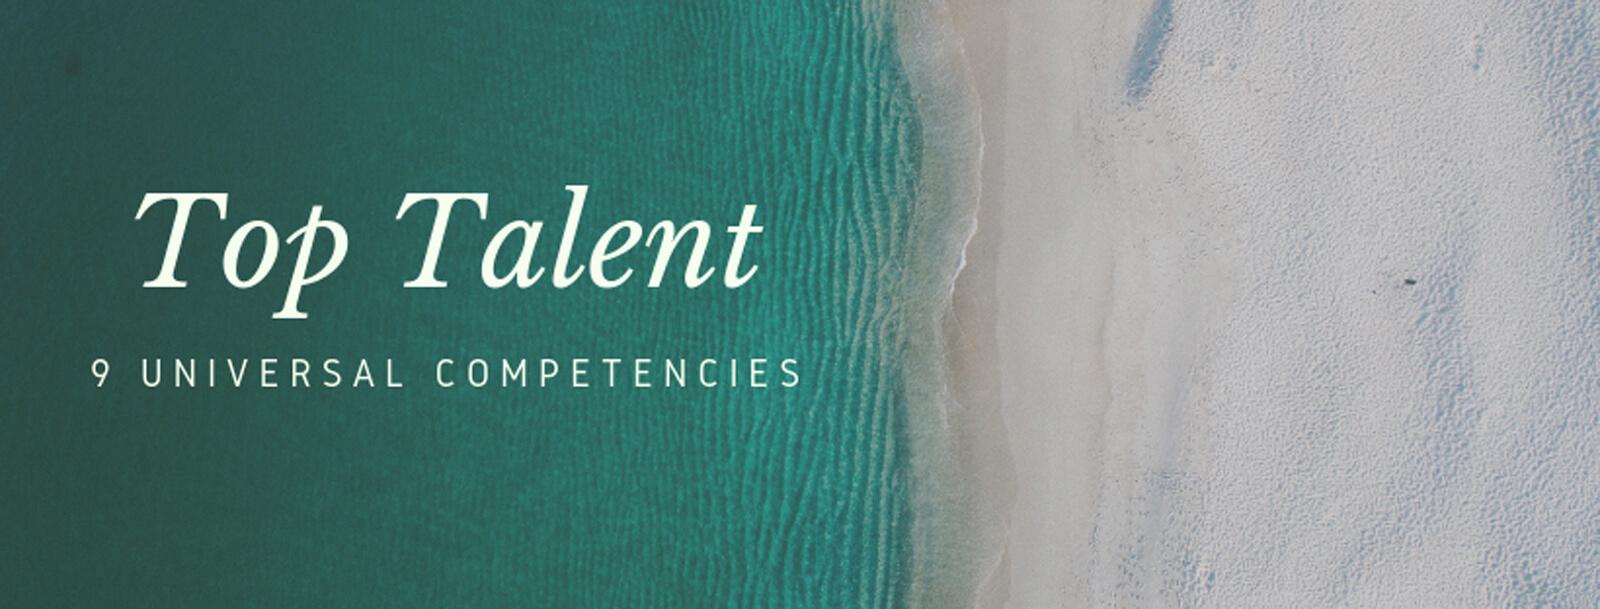 Top Talent : 9 Universal Competencies